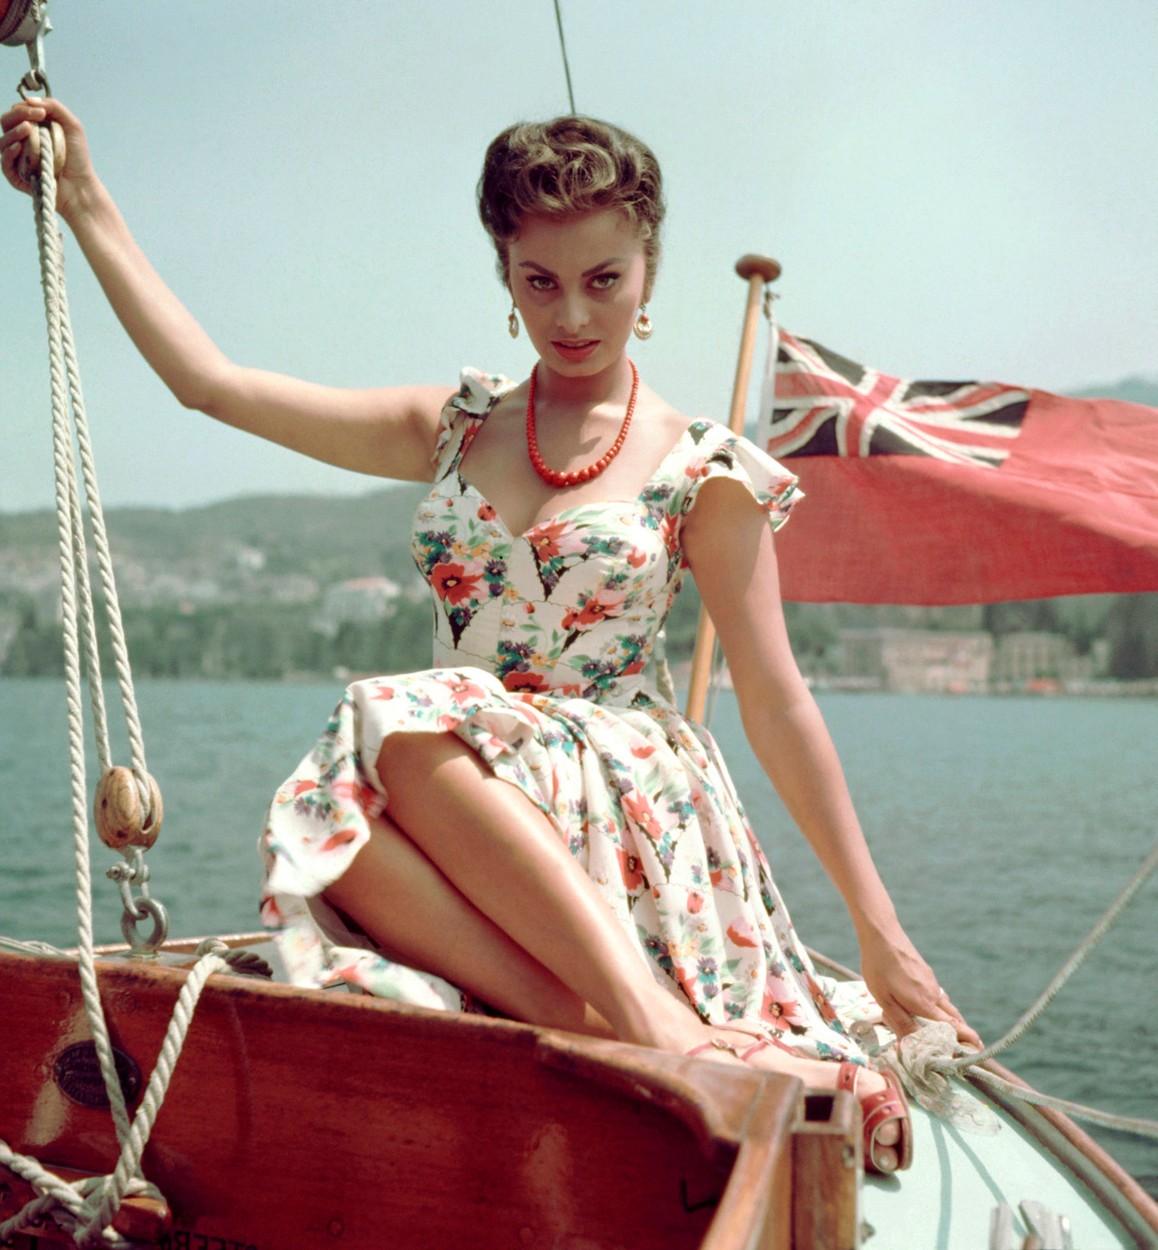 Sophia Loren *Filmstill - Editorial Use Only*,Image: 165805665, License: Rights-managed, Restrictions: *Filmstill - Editorial Use Only*, Model Release: no, Credit line: Image  Capital Pictur / Film Stills / Profimedia